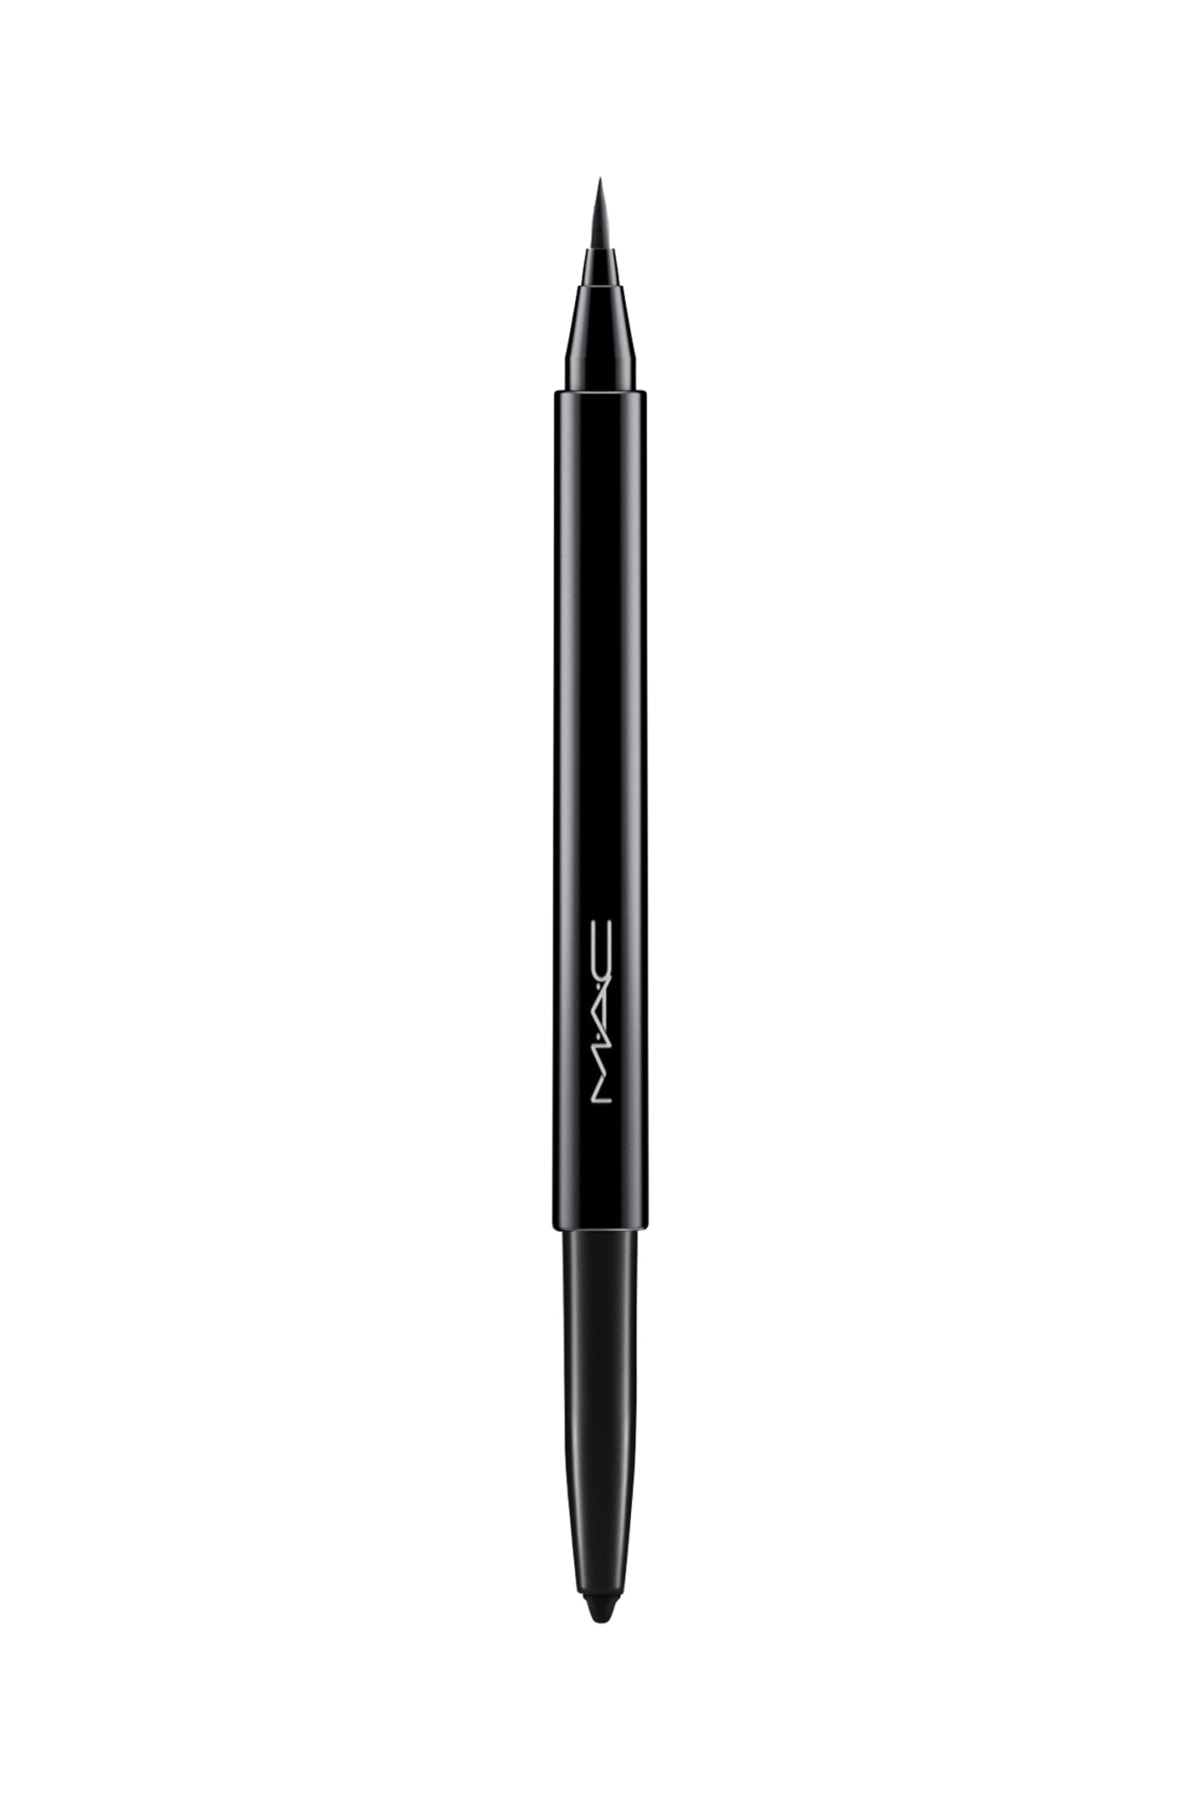 Suya Dayanıklı Eyeliner - M·A·C Dual Dare All-Day Dare Black 773602500482